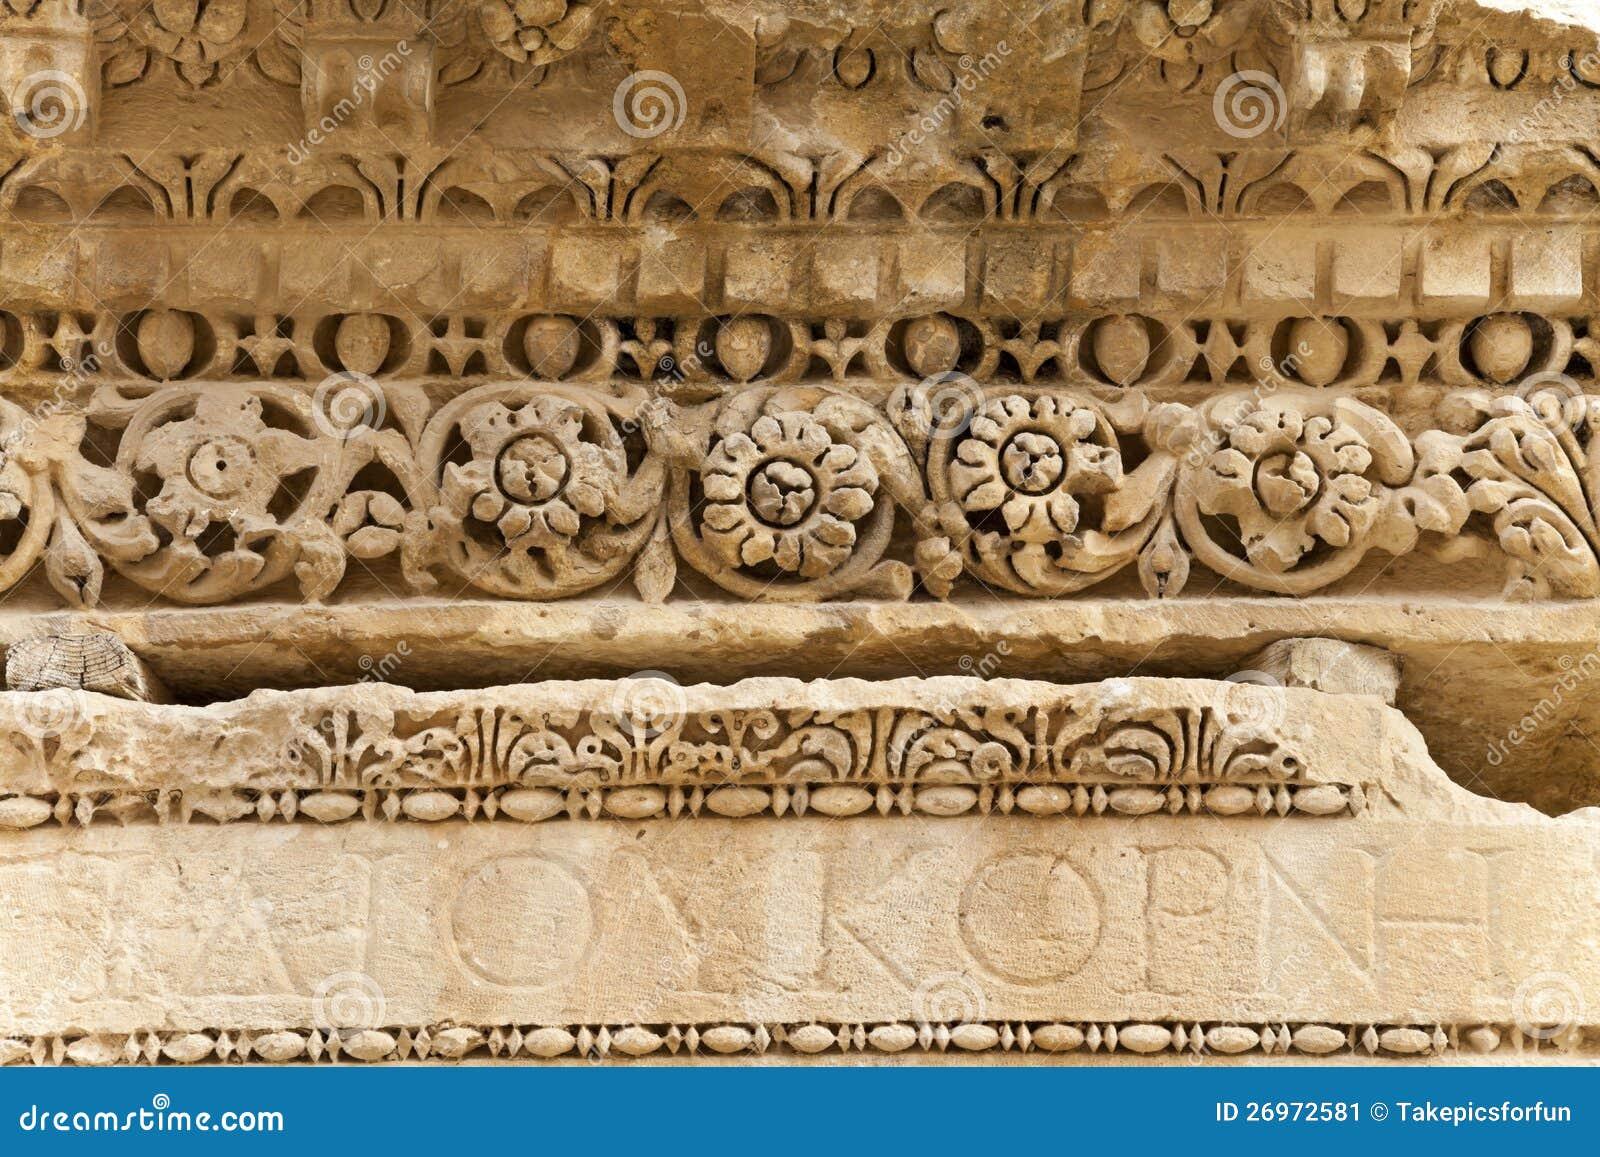 Roman stone carving stock image of arabia